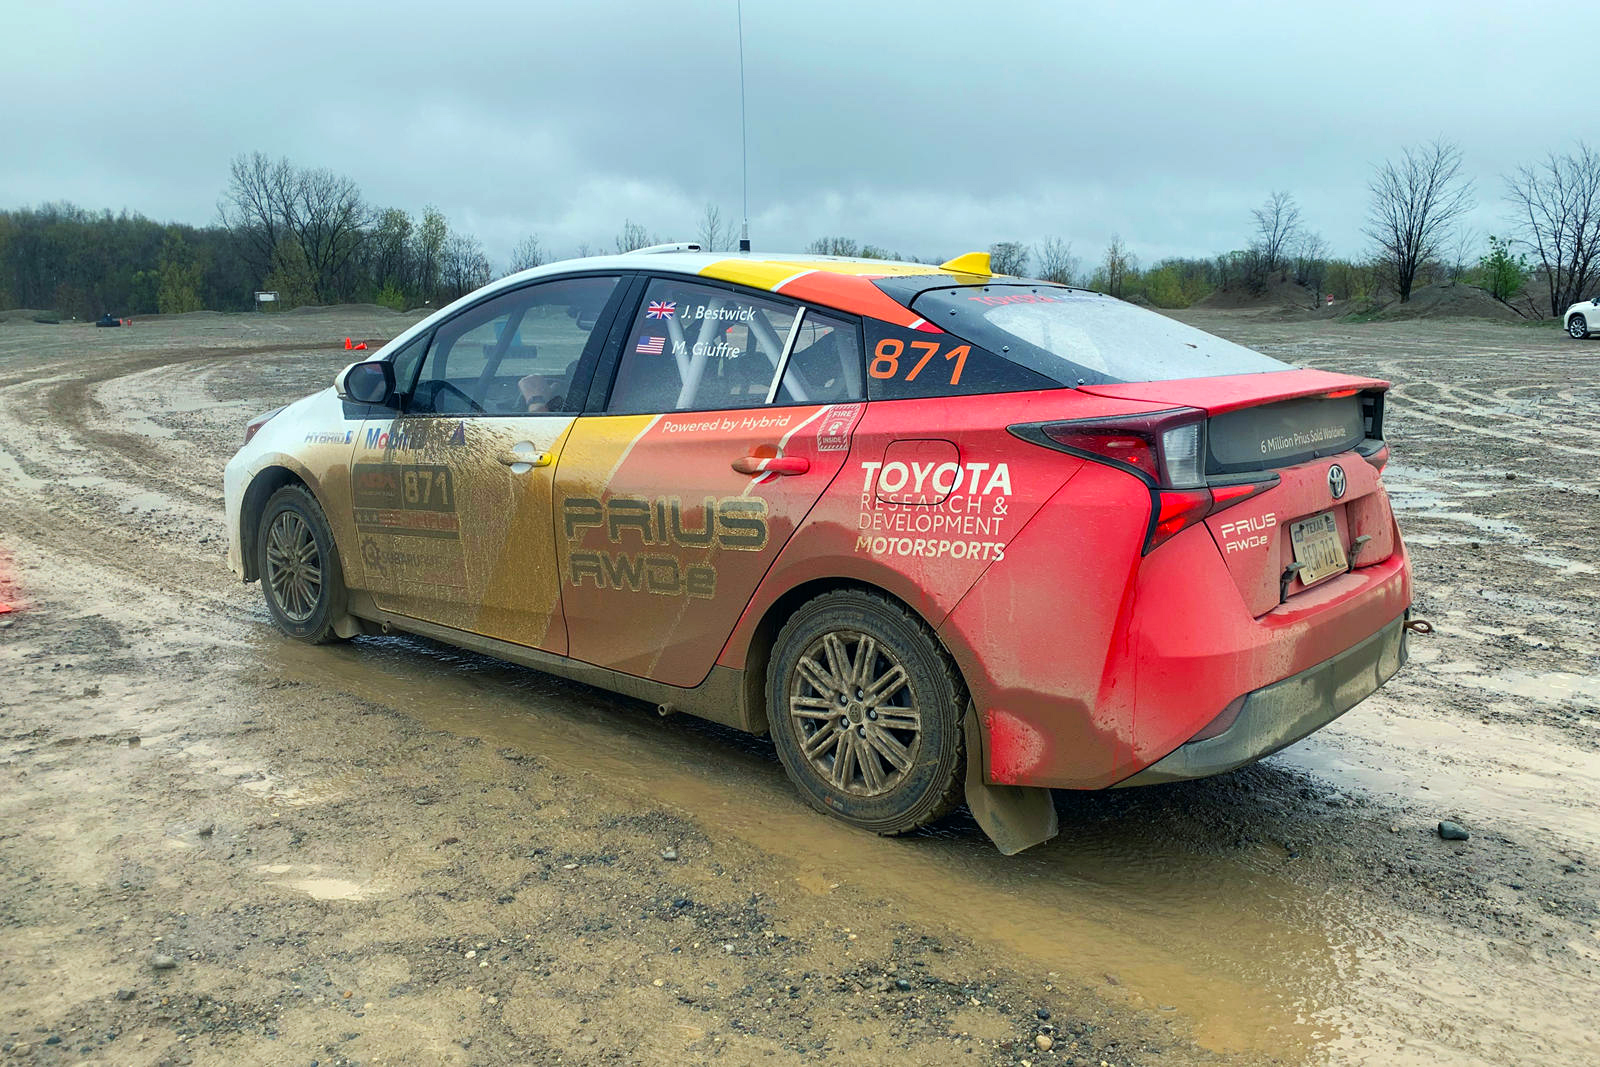 Toyota rali Prius